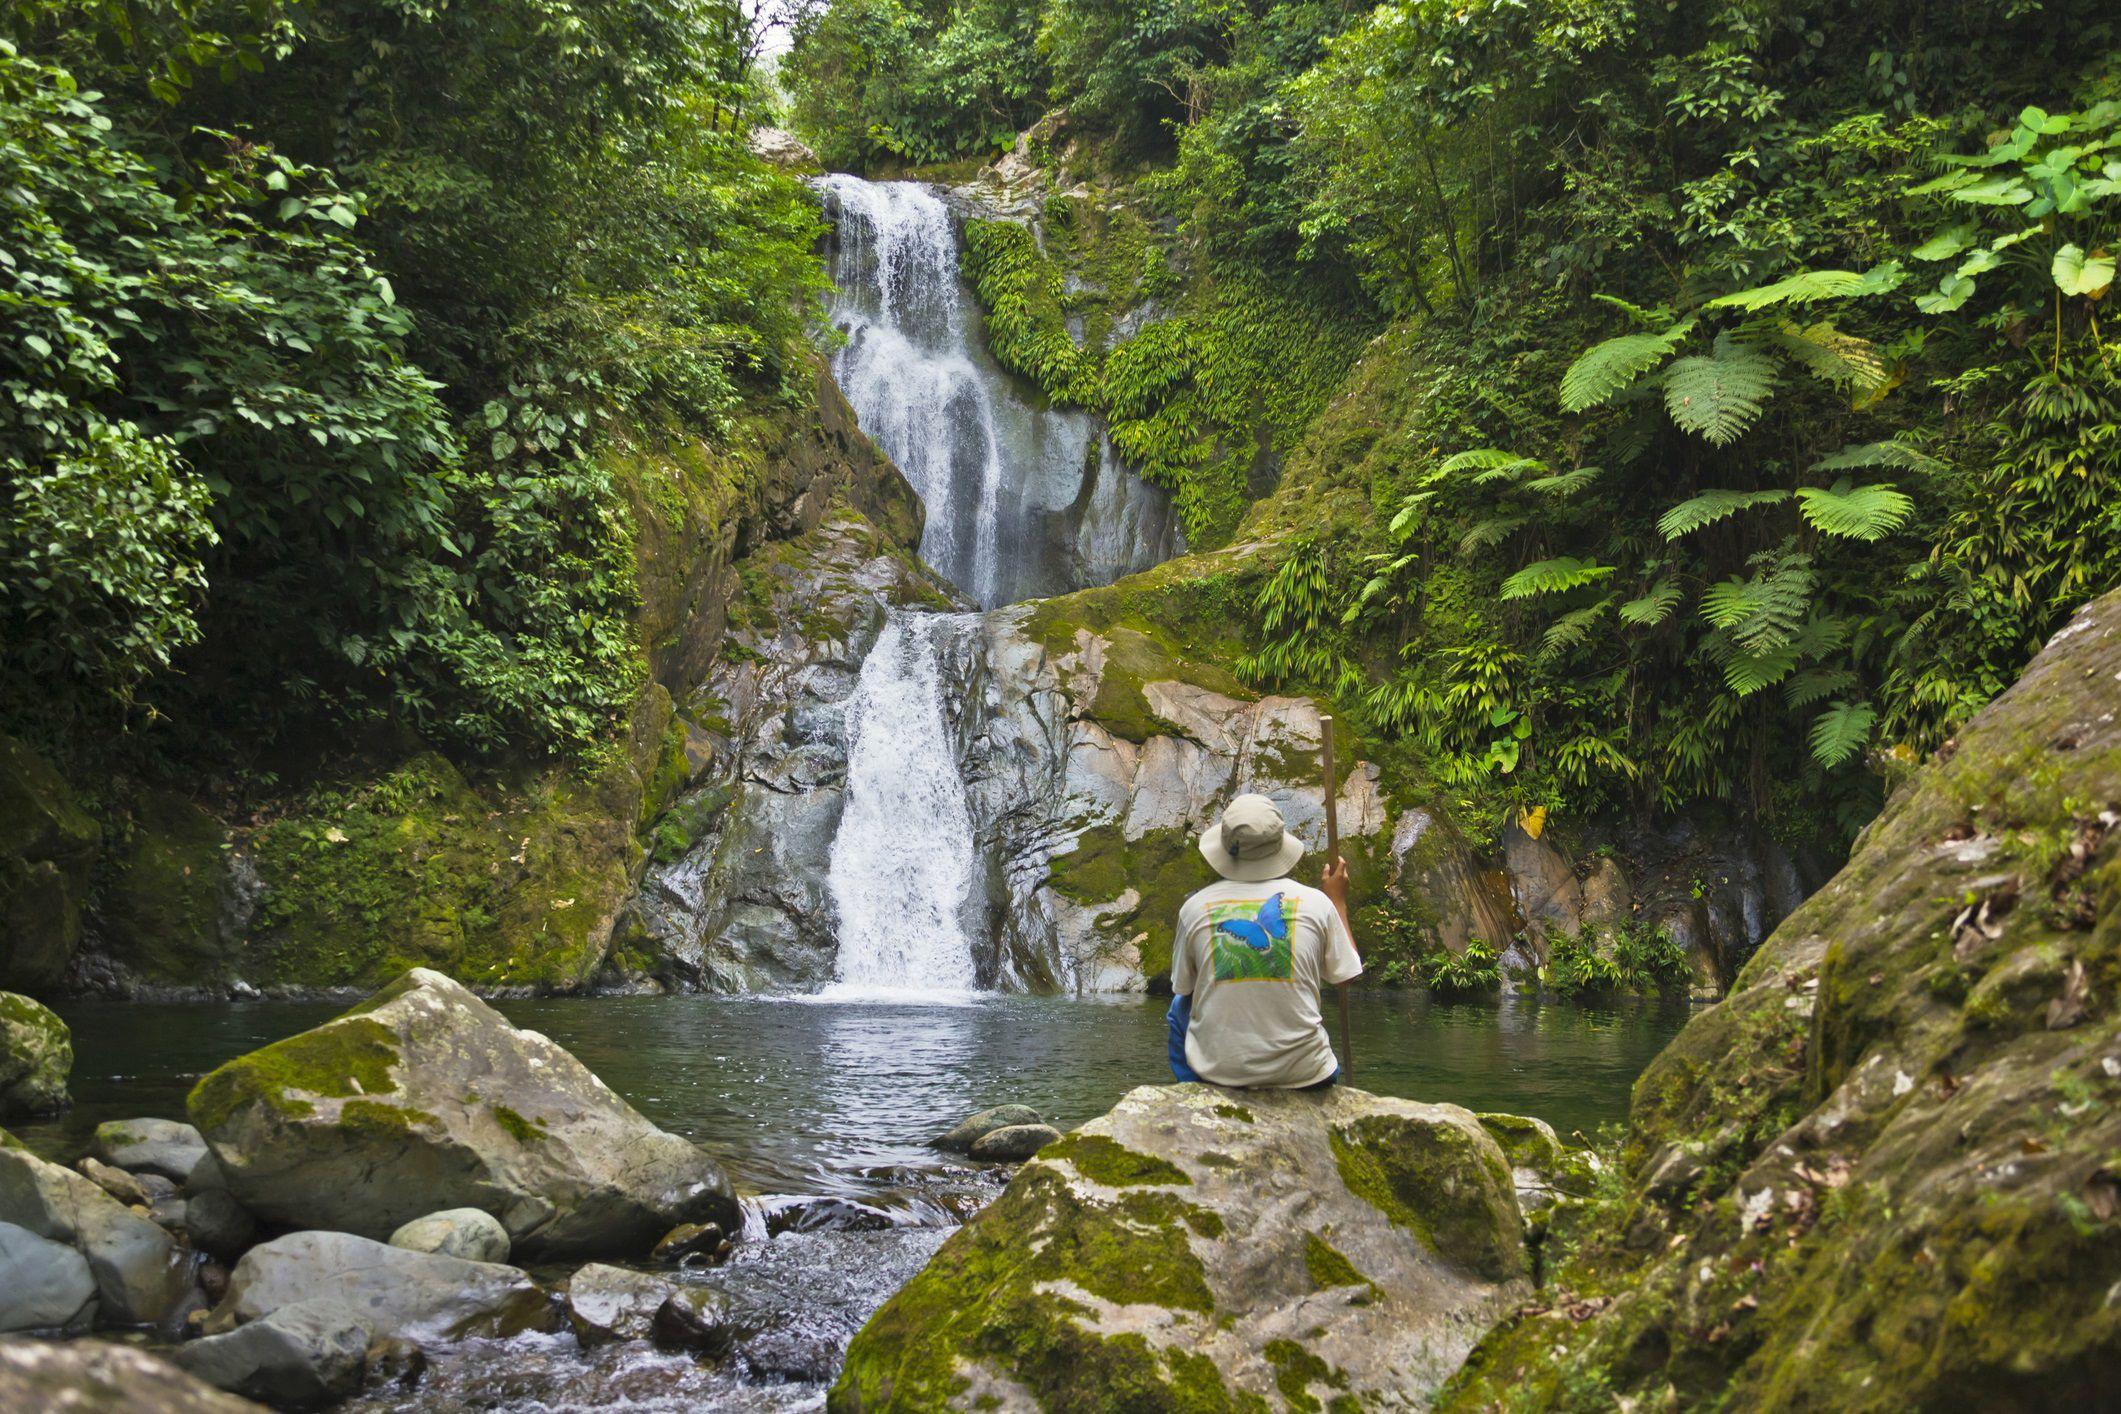 Turista en cascada en la selva tropical, Parque Nacional Pico Bonito, Honduras